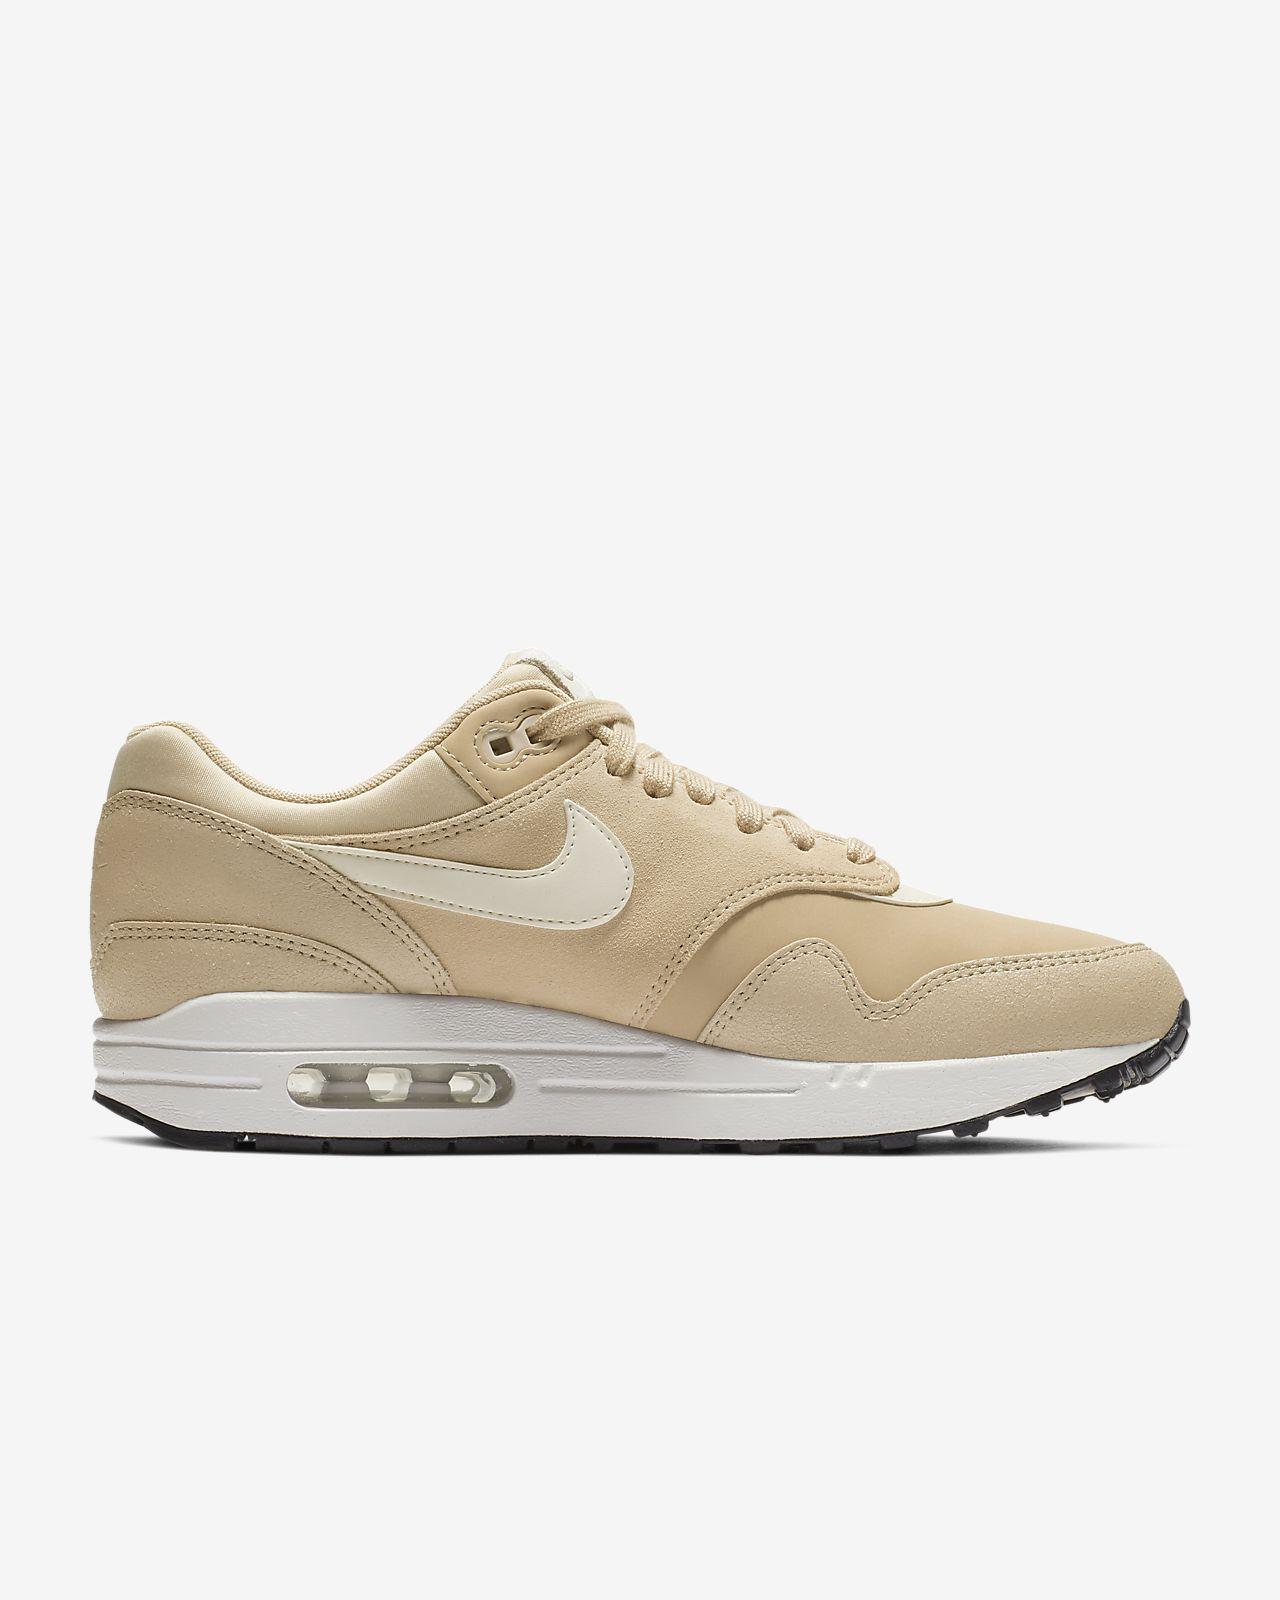 half off 9c43a 9c4cf ... Nike Air Max 1 Premium Women s Shoe